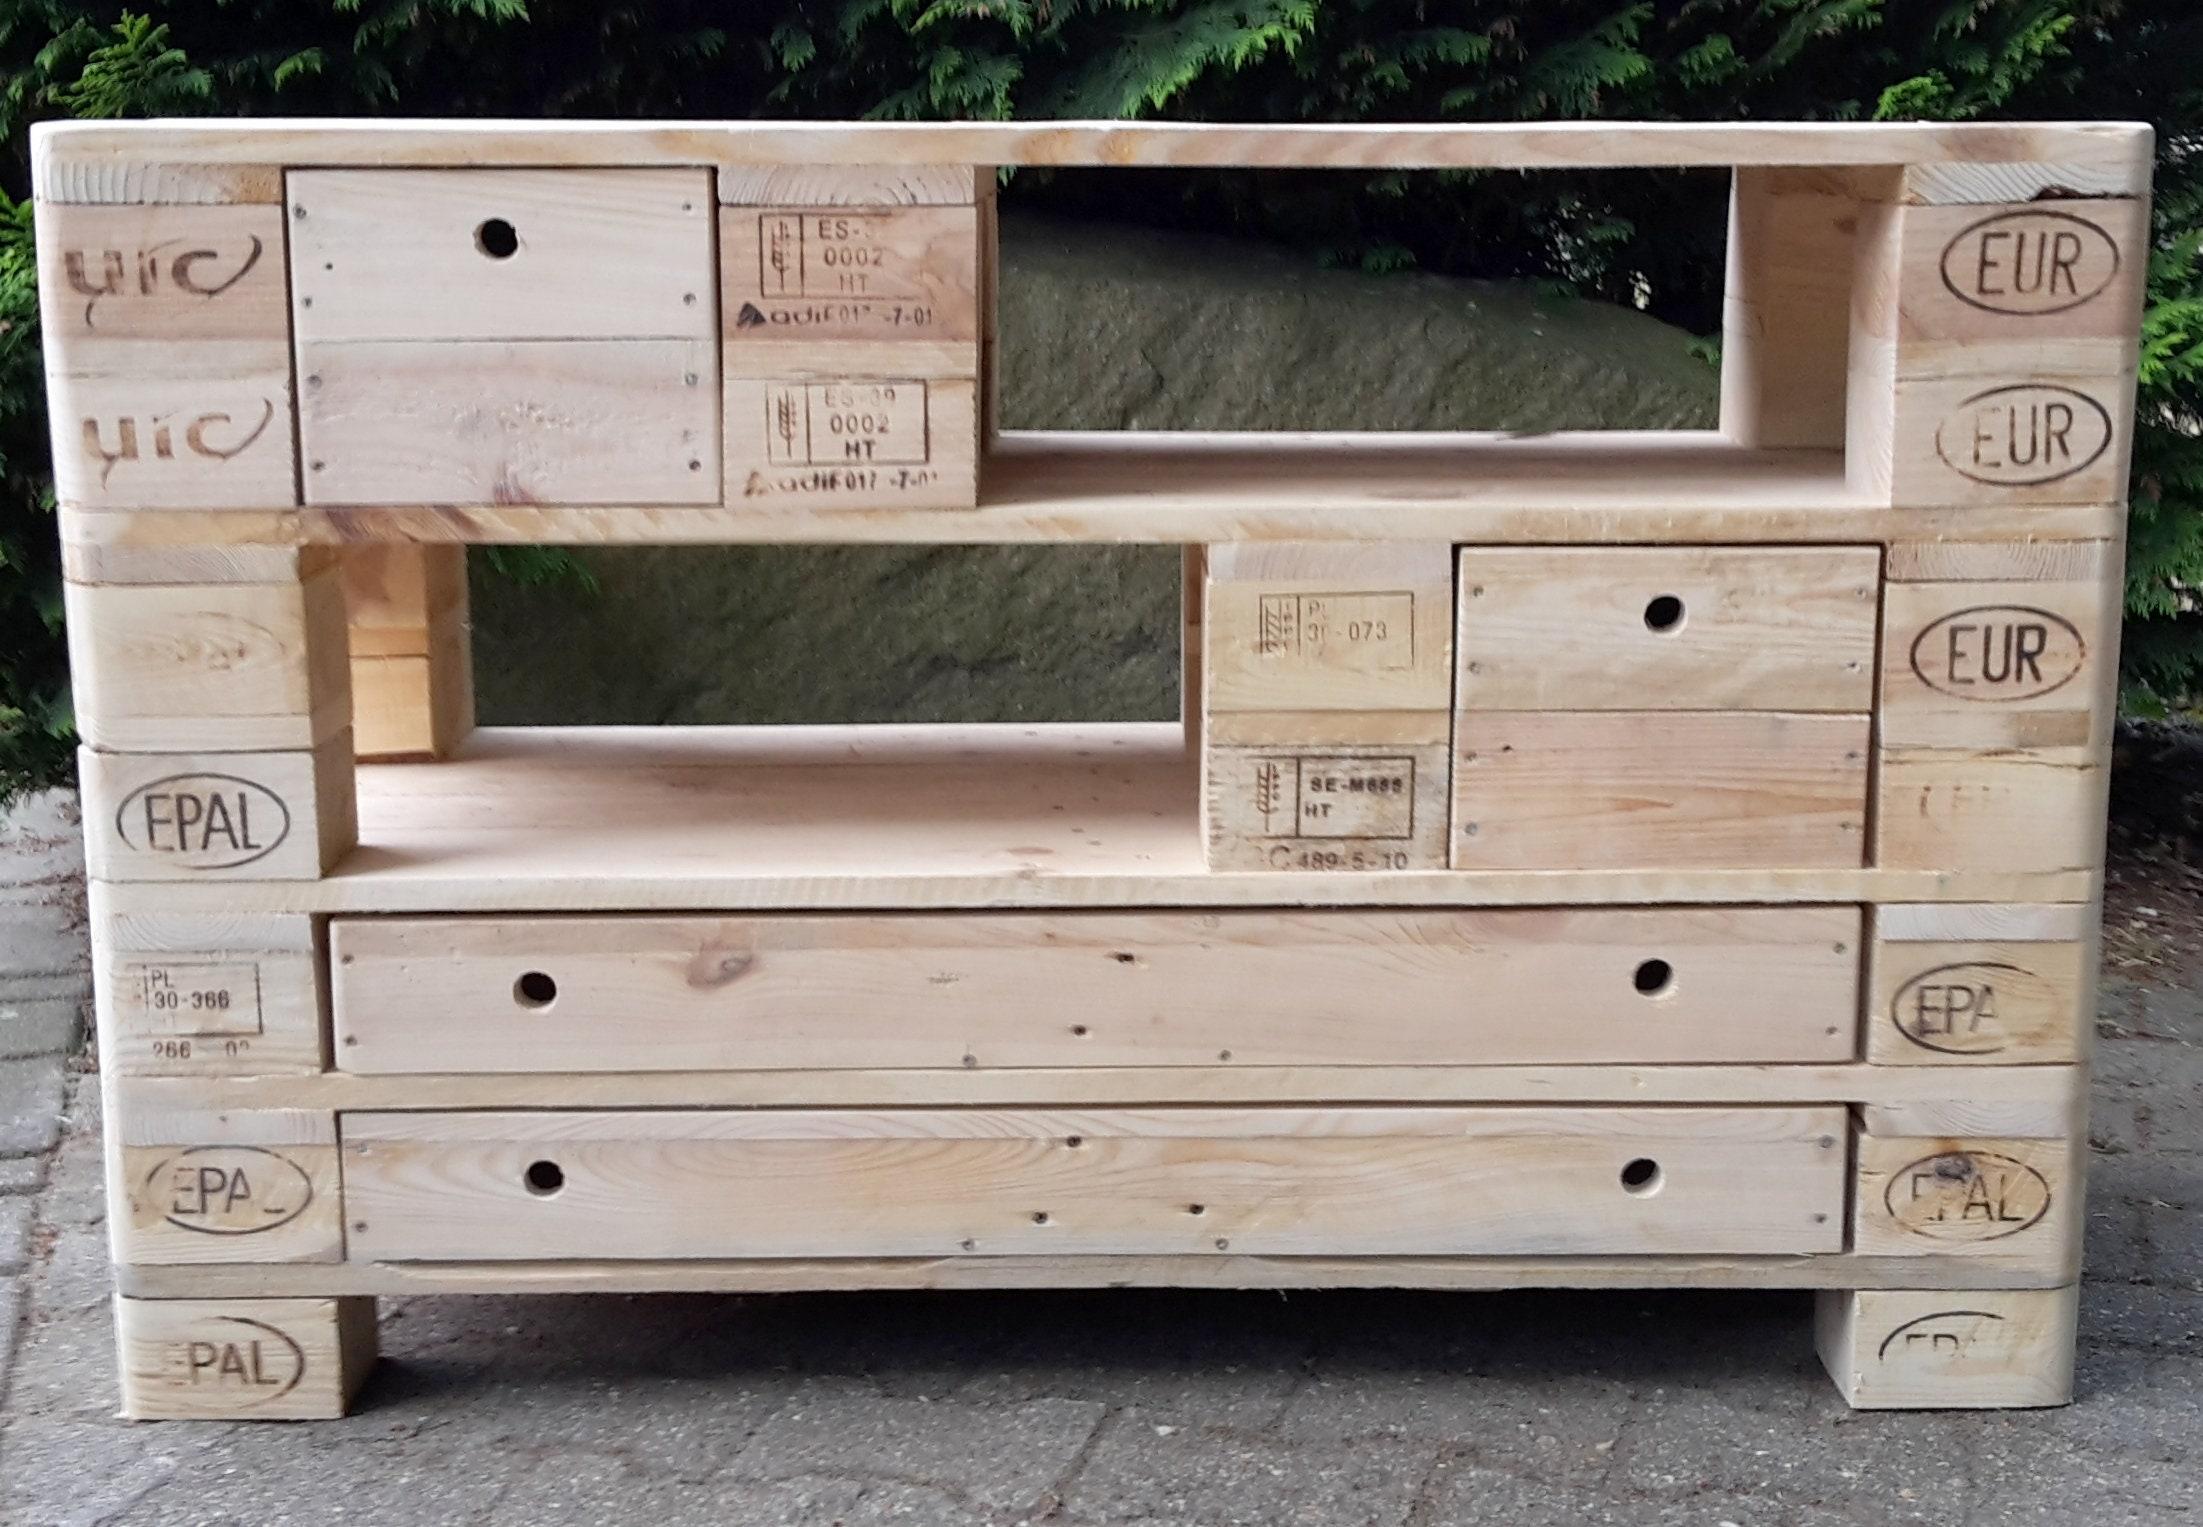 xxl sideboard tv schrank aus paletten palettenm bel etsy. Black Bedroom Furniture Sets. Home Design Ideas